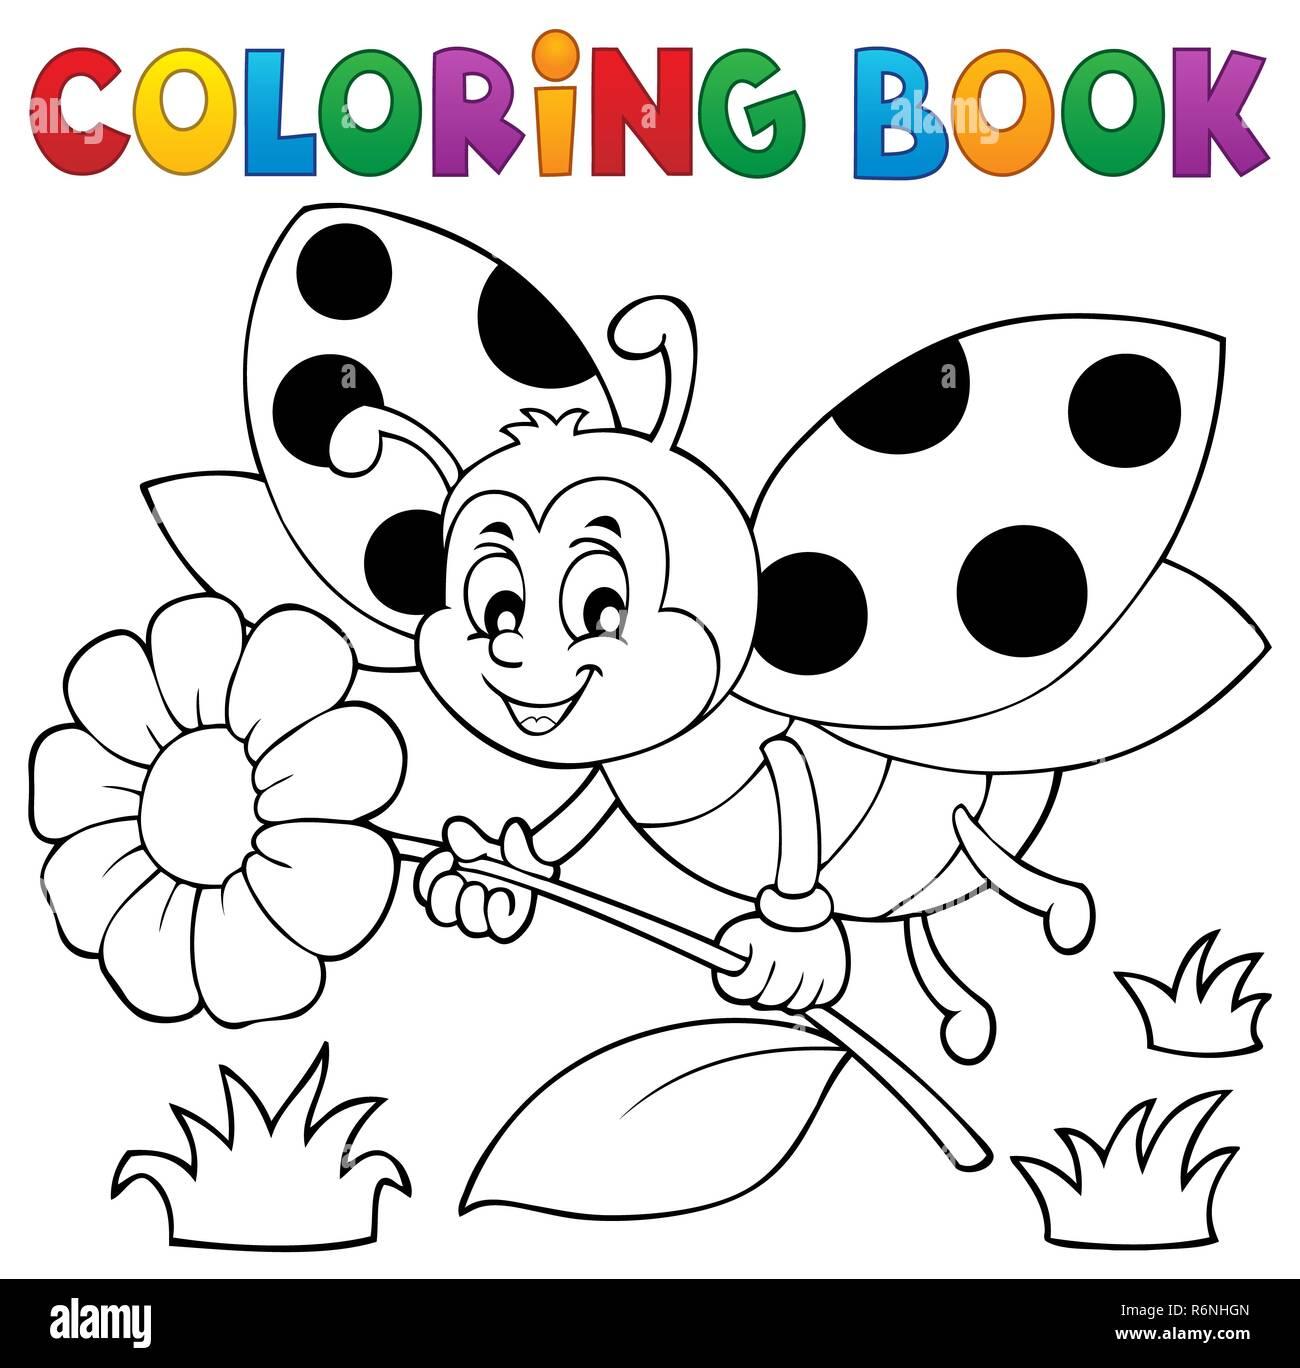 Coloring book ladybug theme 4 Stock Photo: 227897509 - Alamy